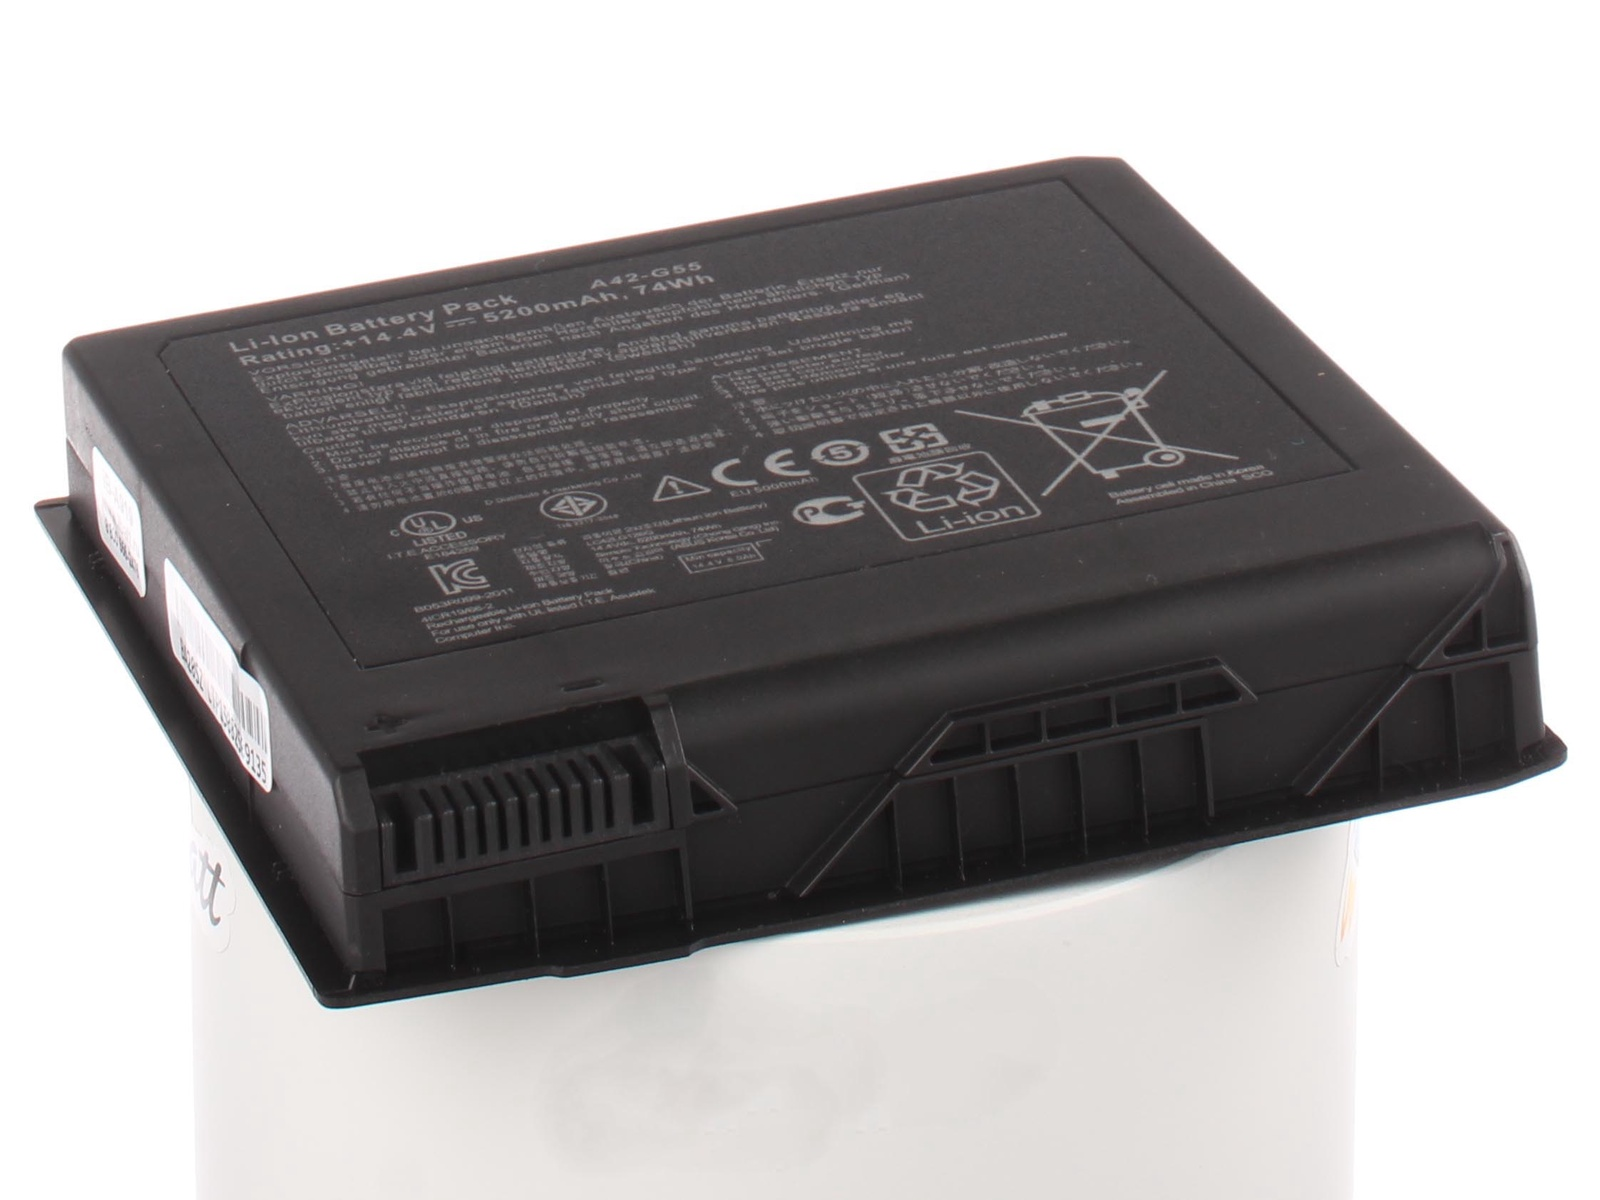 Аккумулятор для ноутбука iBatt для Asus N751JK, N551JM, G771JW, N551J, N751J, G771J, N551VW, N751JX, ROG G771JW, N551, N551JB, G551JK, N751, G771, G551JX, G551, G551JM, N551JK, G551JW, ROG G771J, G771JW-T7140H, ROG G551JX